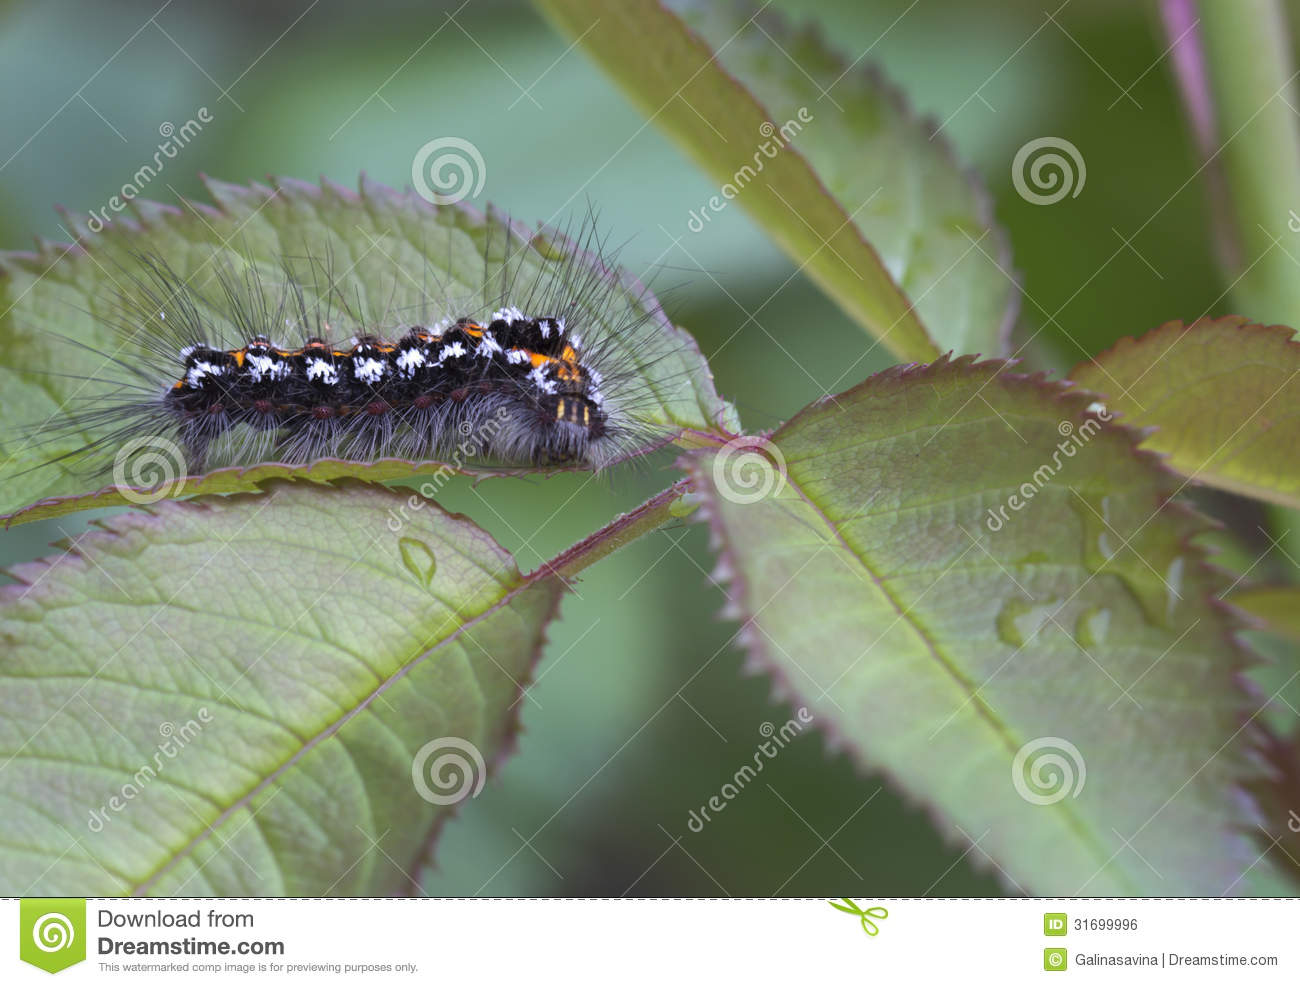 Lymantriidae Free Stock Photos & Pictures, Lymantriidae Royalty.